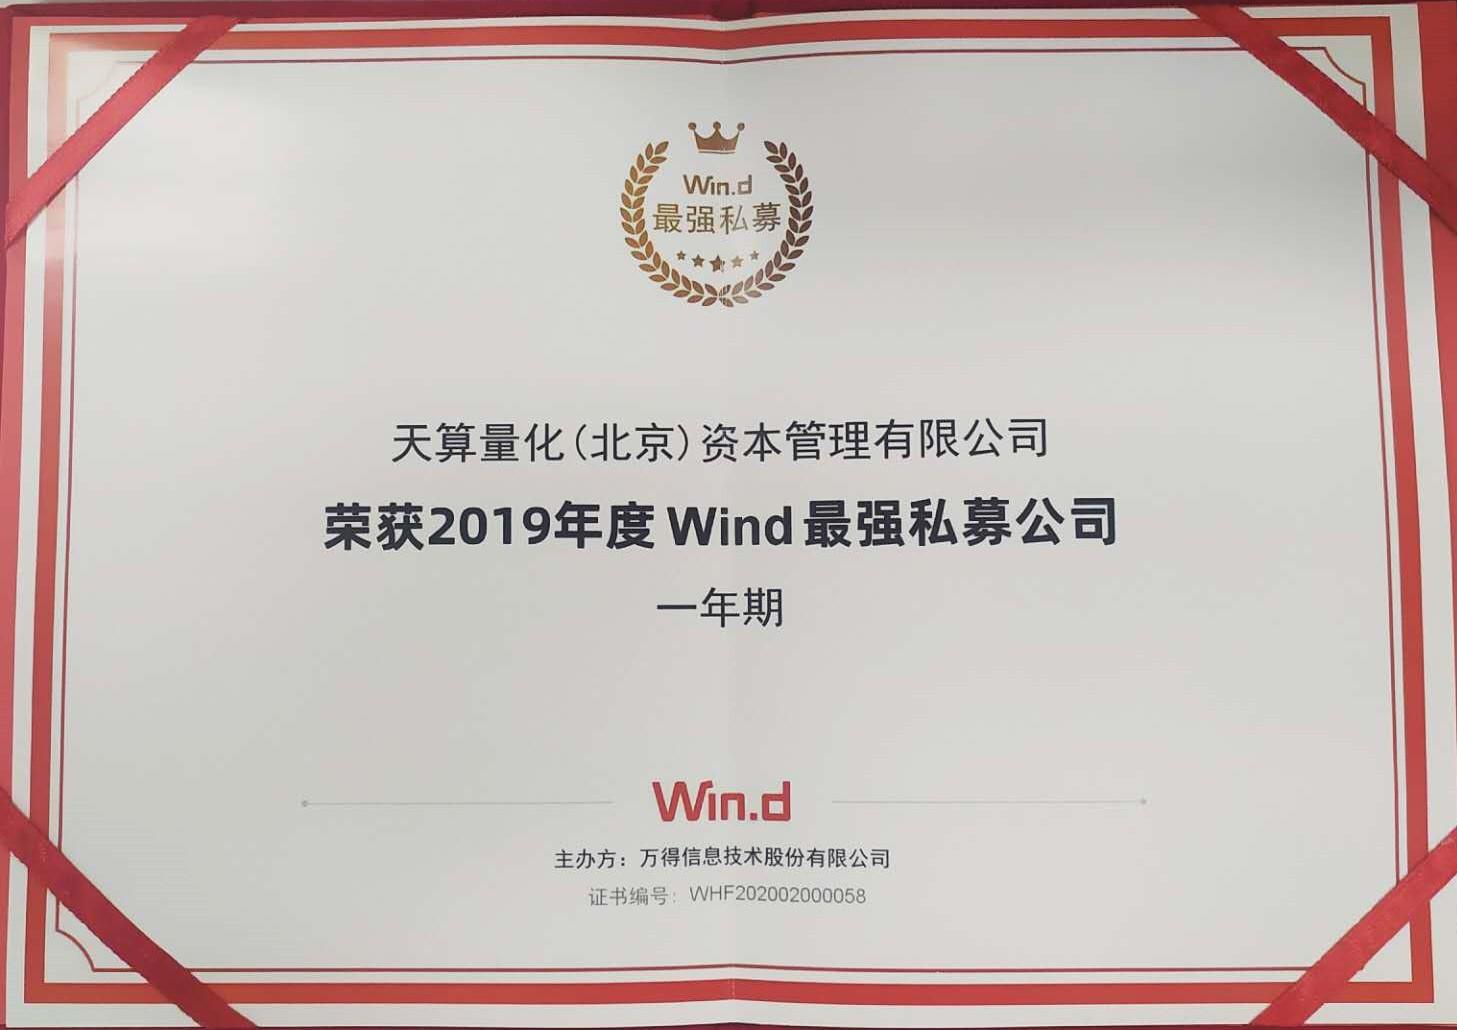 wind-2019最强私募公司-一年期.jpg